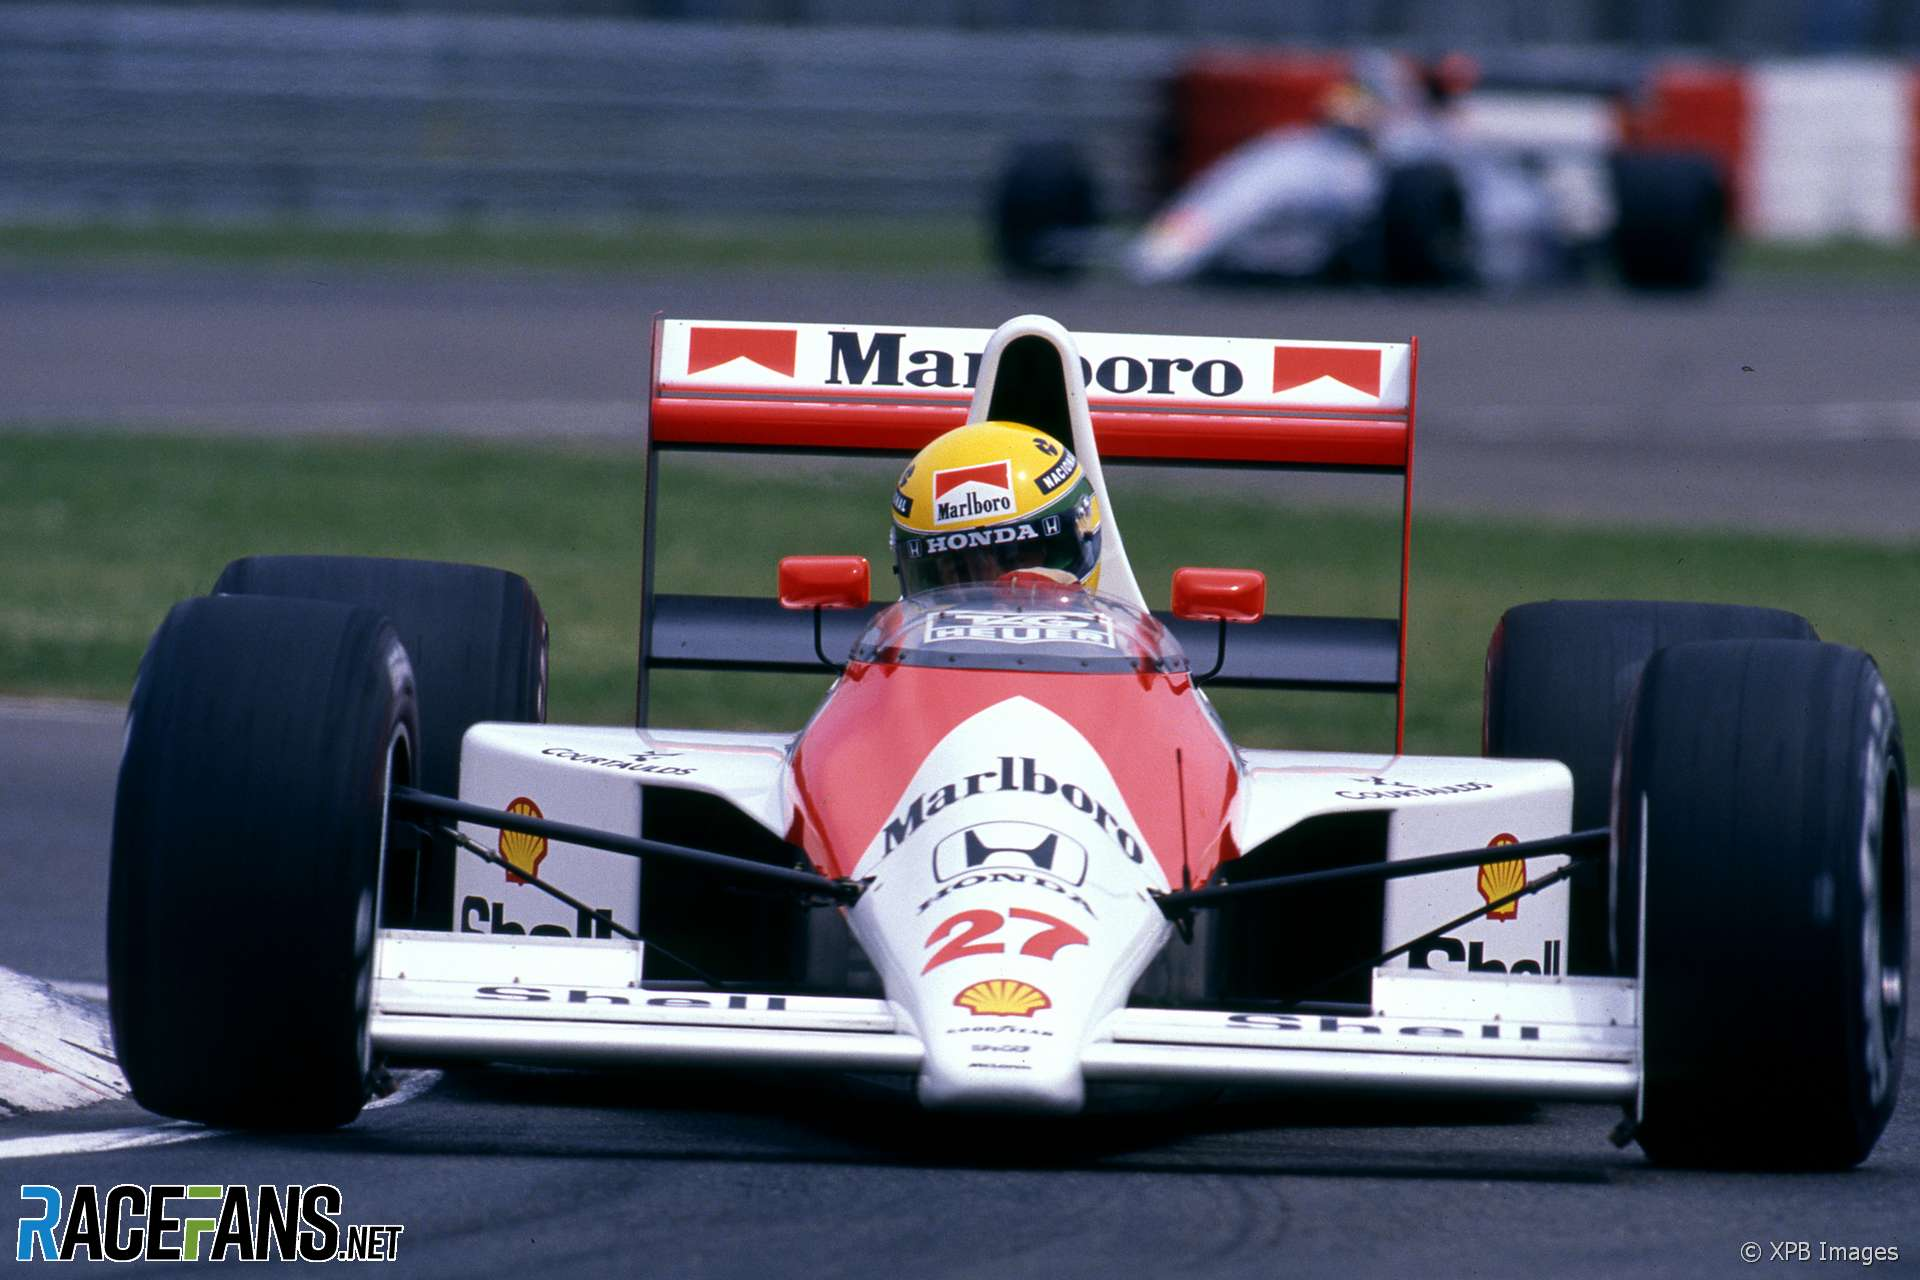 Ayrton Senna, McLaren, Imola, 1990